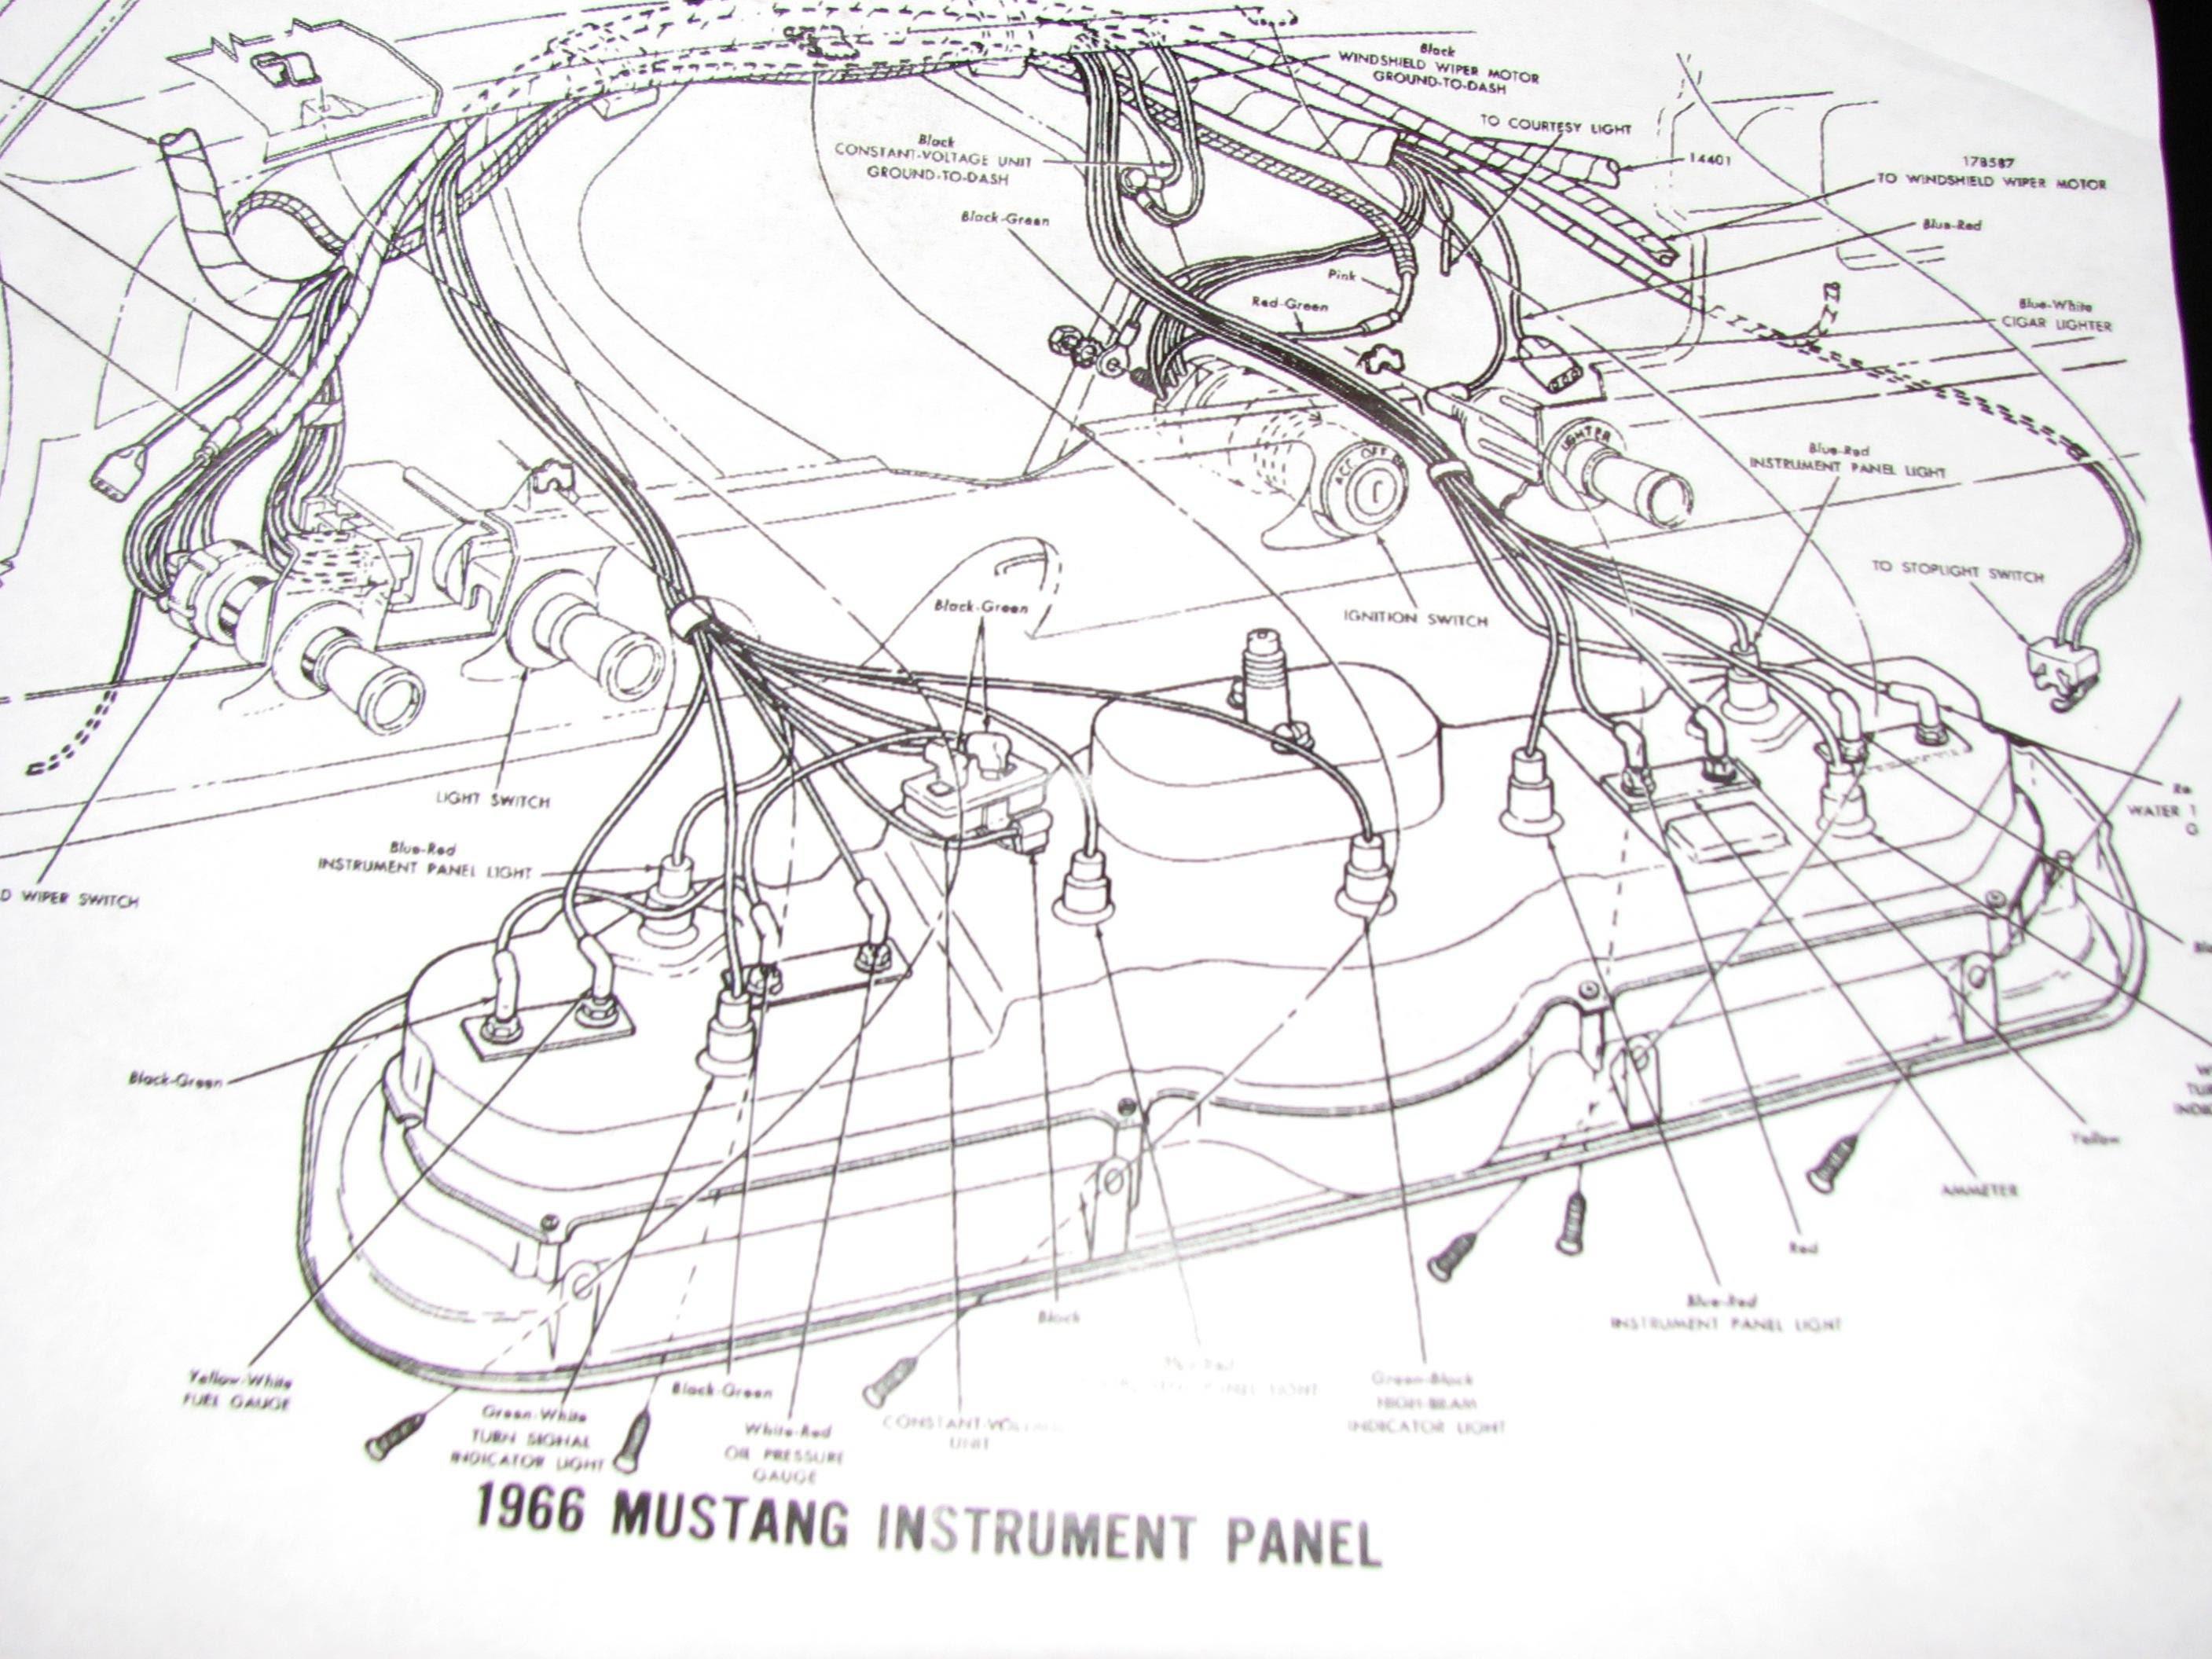 1968 Mustang Instrument Wiring Diagram Clarion Cz100 Wiring Harness Diagram Maxoncb Kankubuktikan Jeanjaures37 Fr